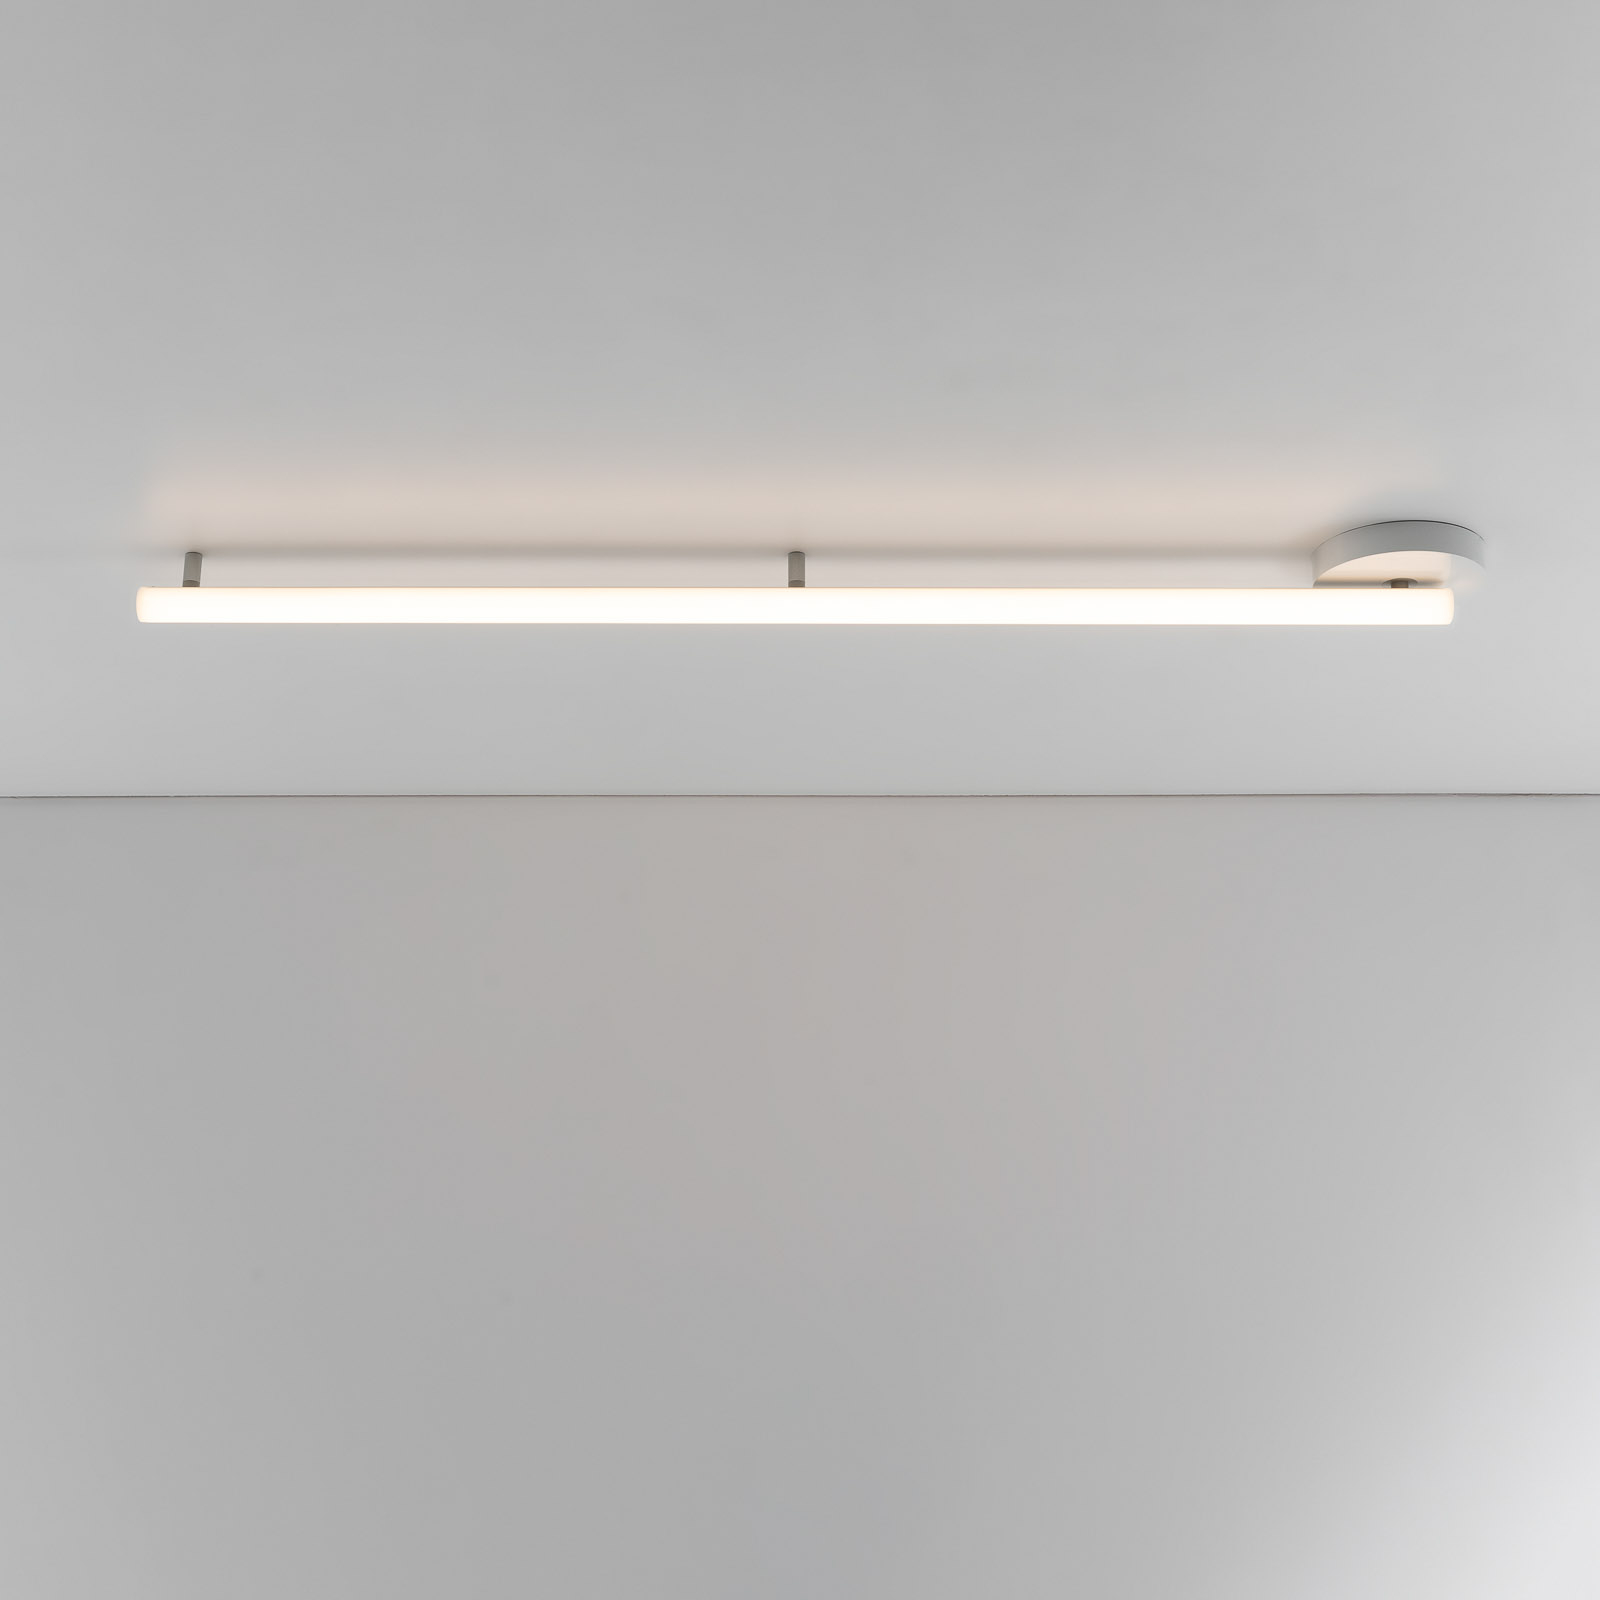 Artemide Alphabet of light lineær, loft, 120 cm